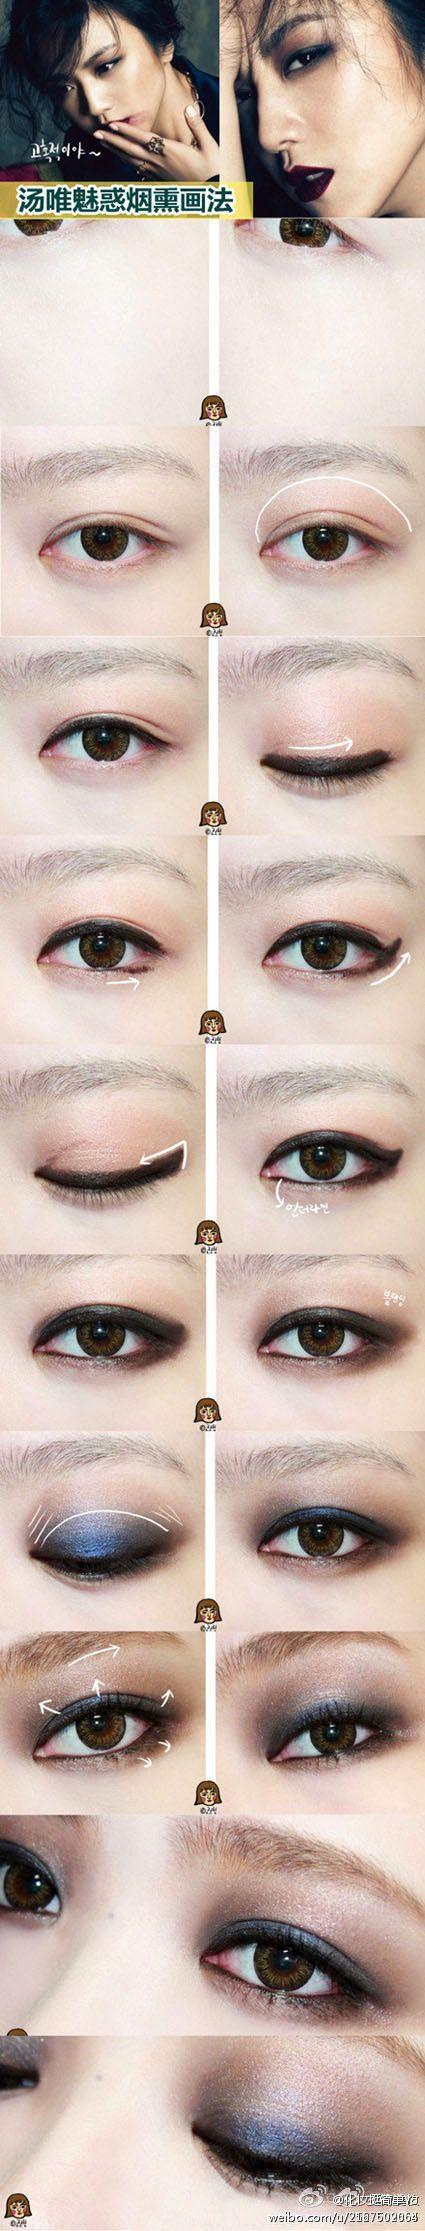 japanese make up tutorial - www.AsianSkincare.Rocks